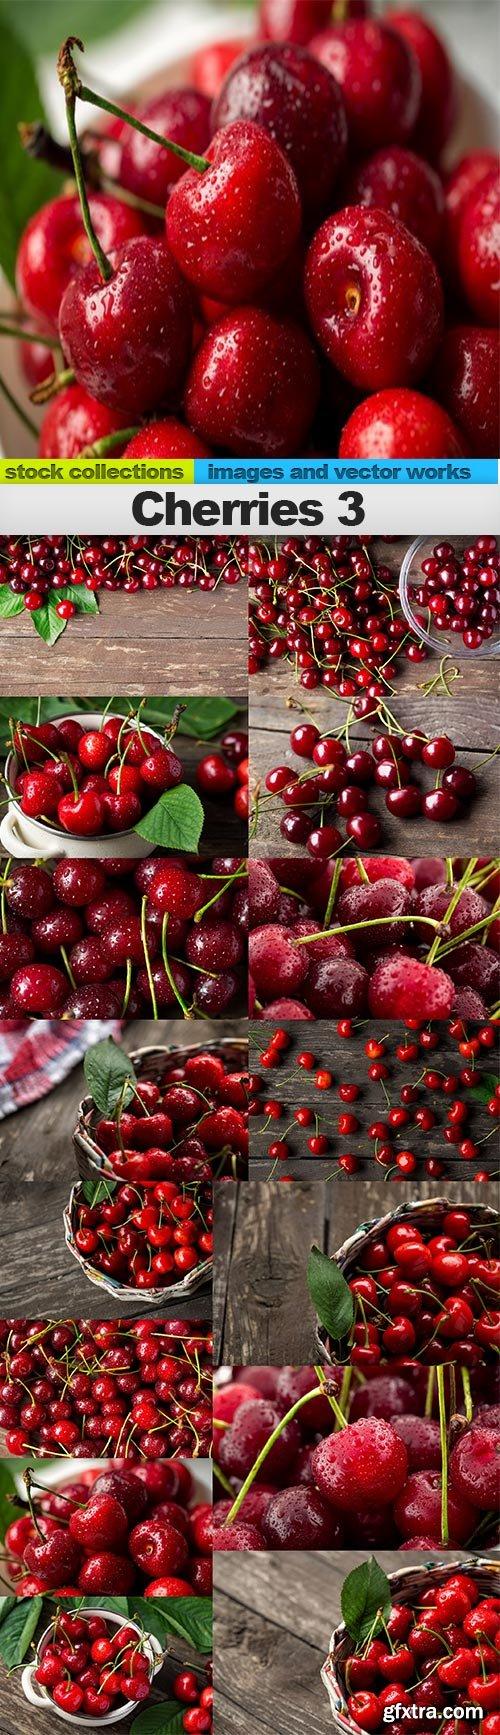 Cherries 3, 15 x UHQ JPEG